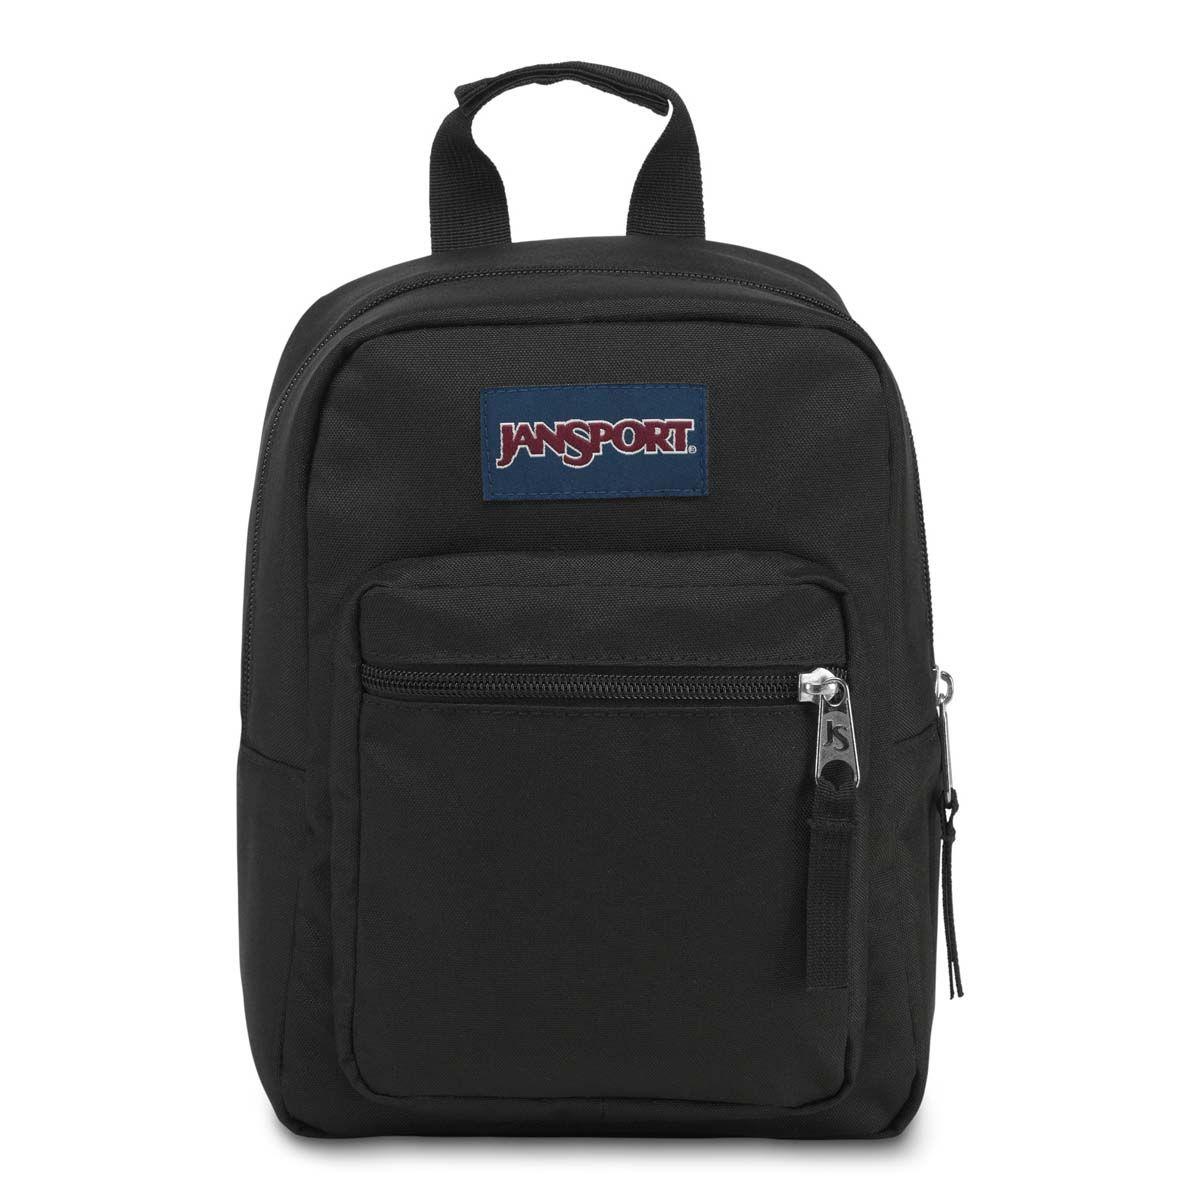 JanSport Big Break Lunch Bag in Black